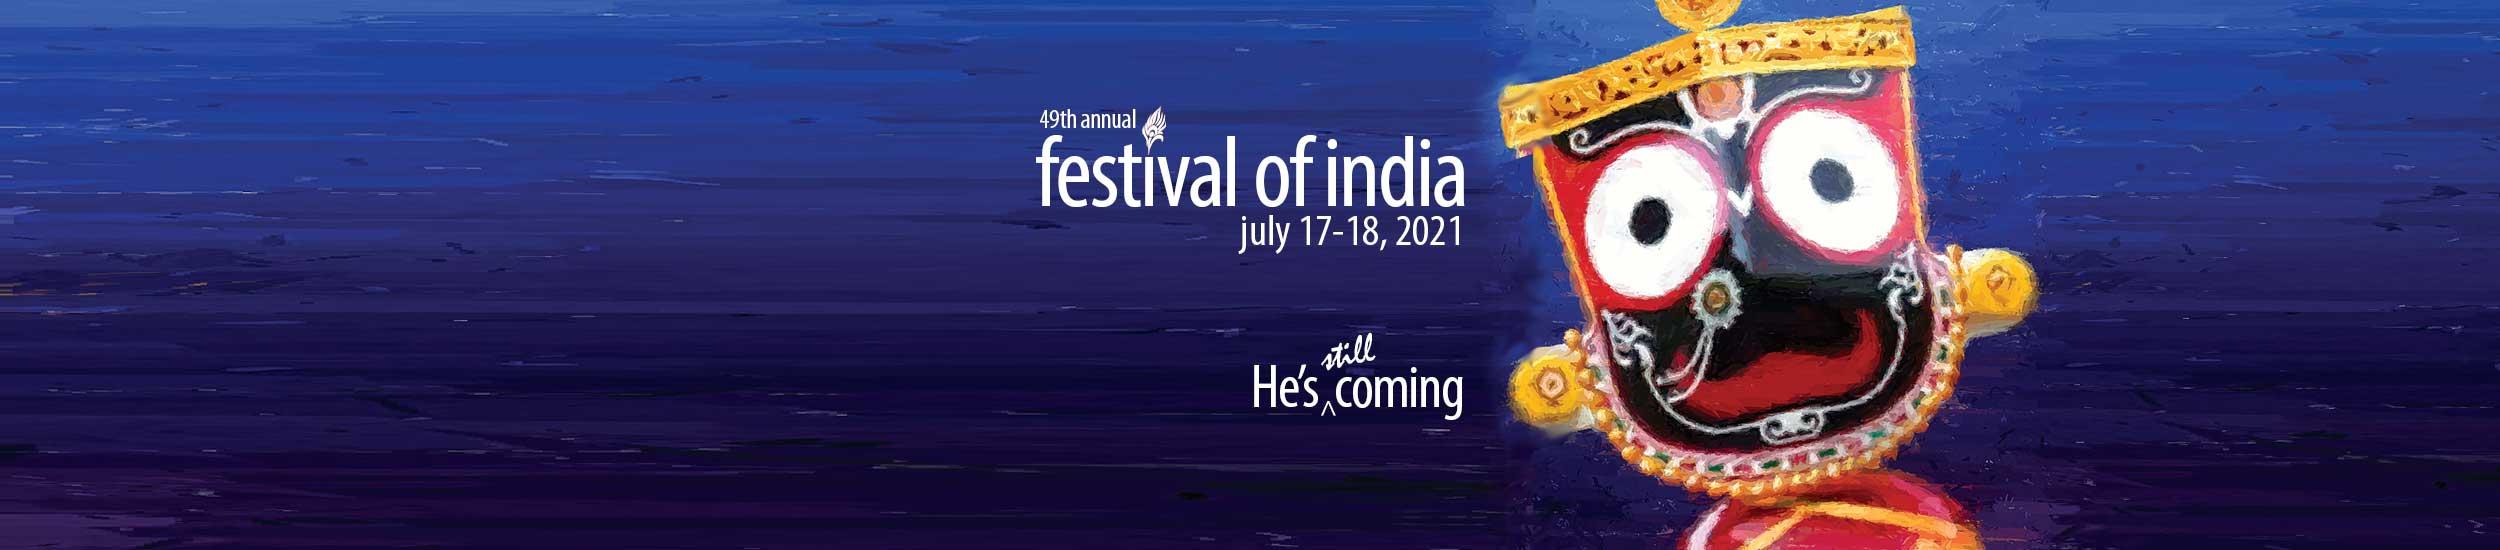 Arts & Culture | 47th Annual Festival of India | July 13-14, 2019